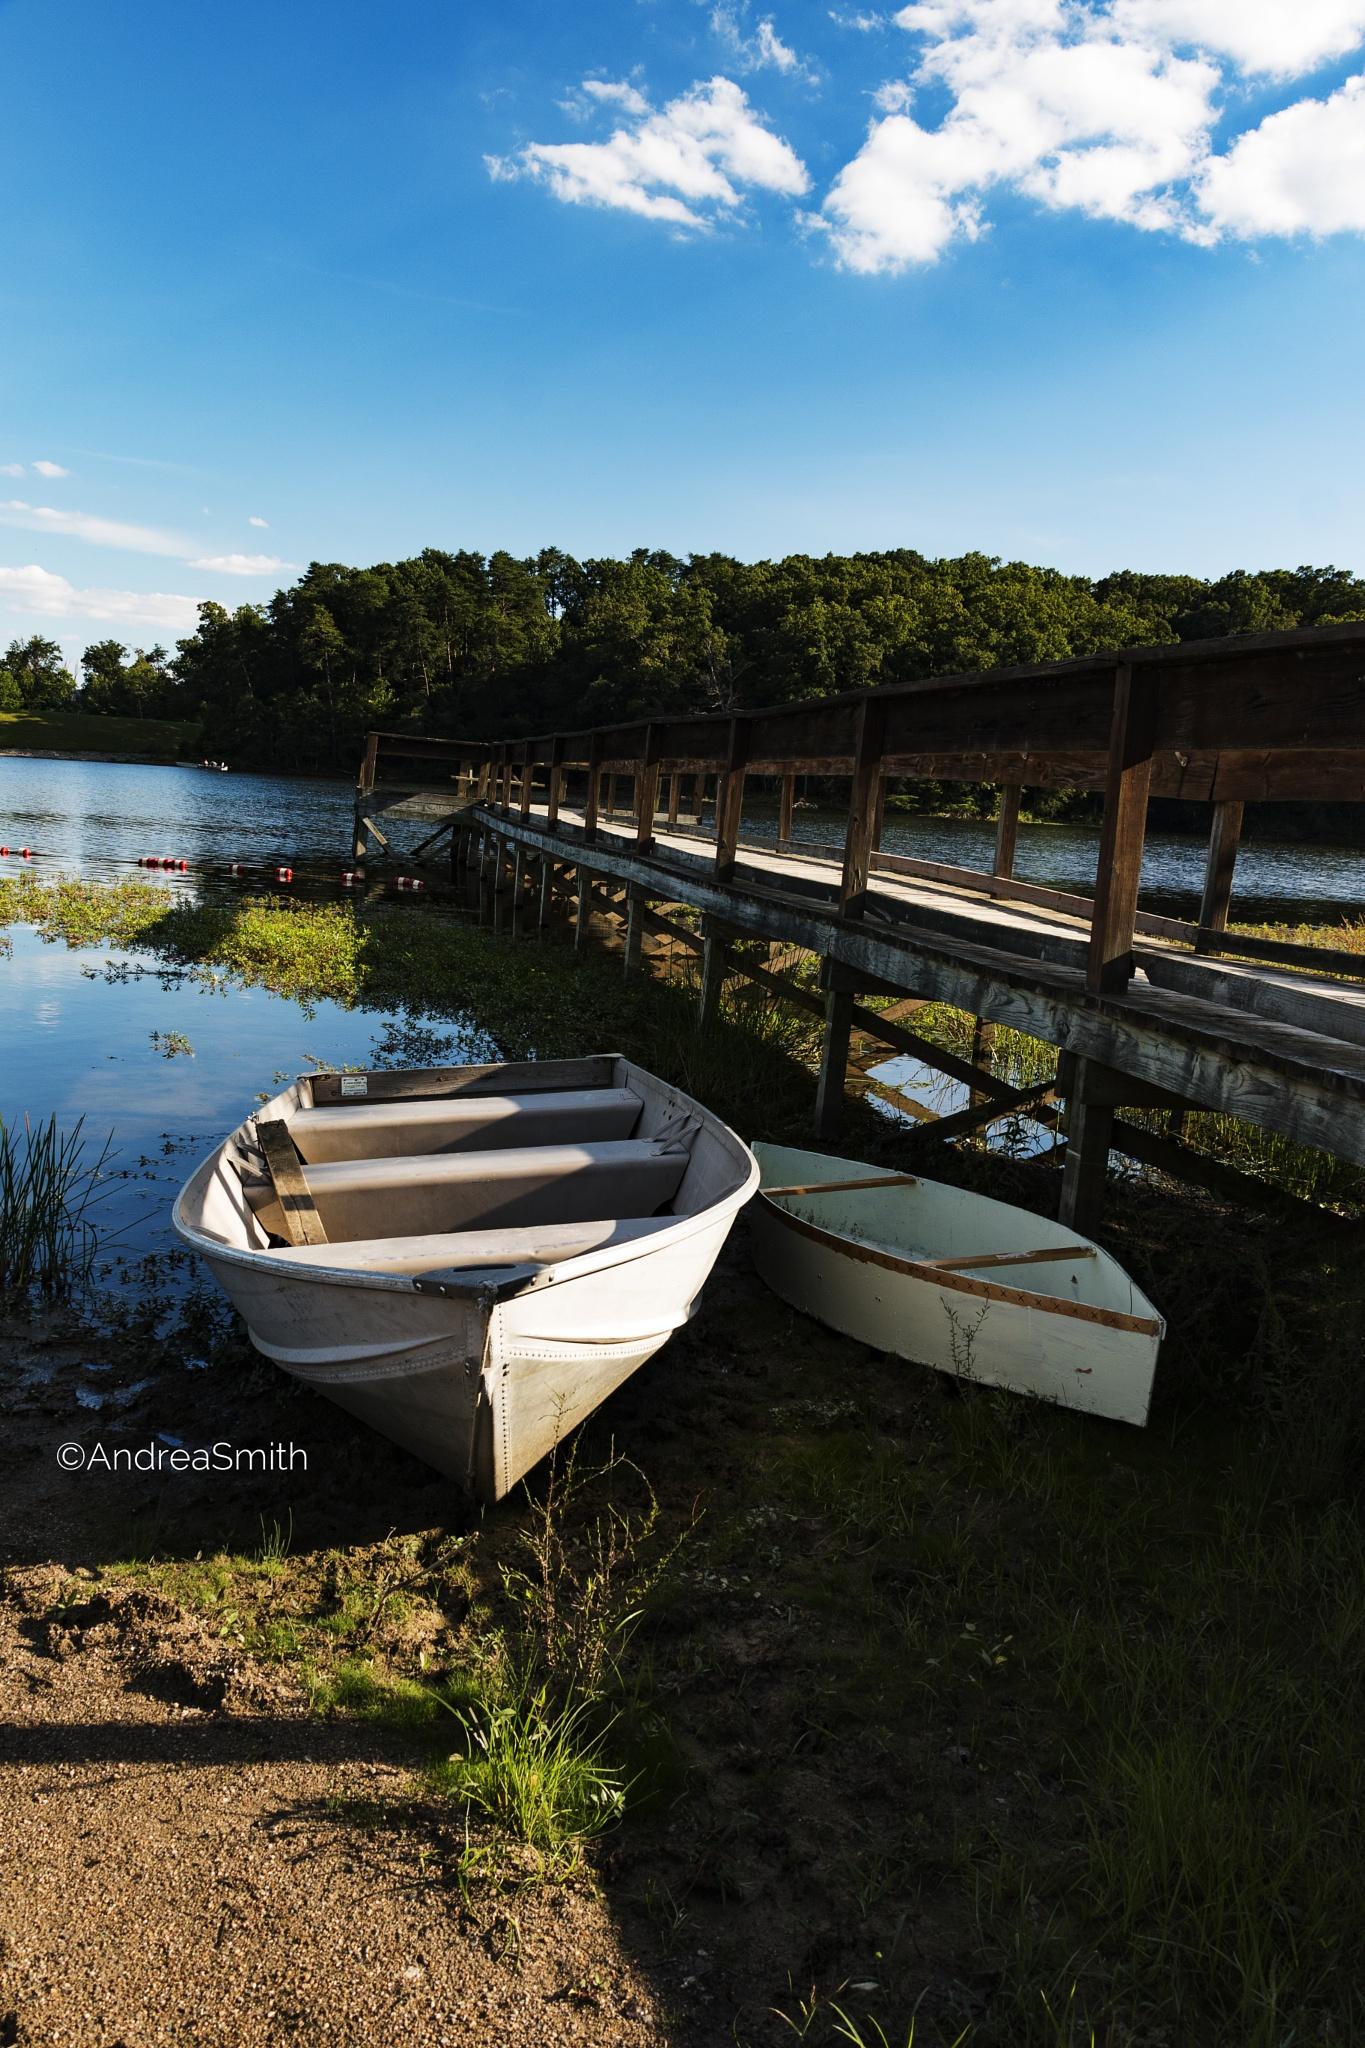 Boat #3 by Andrea Smith